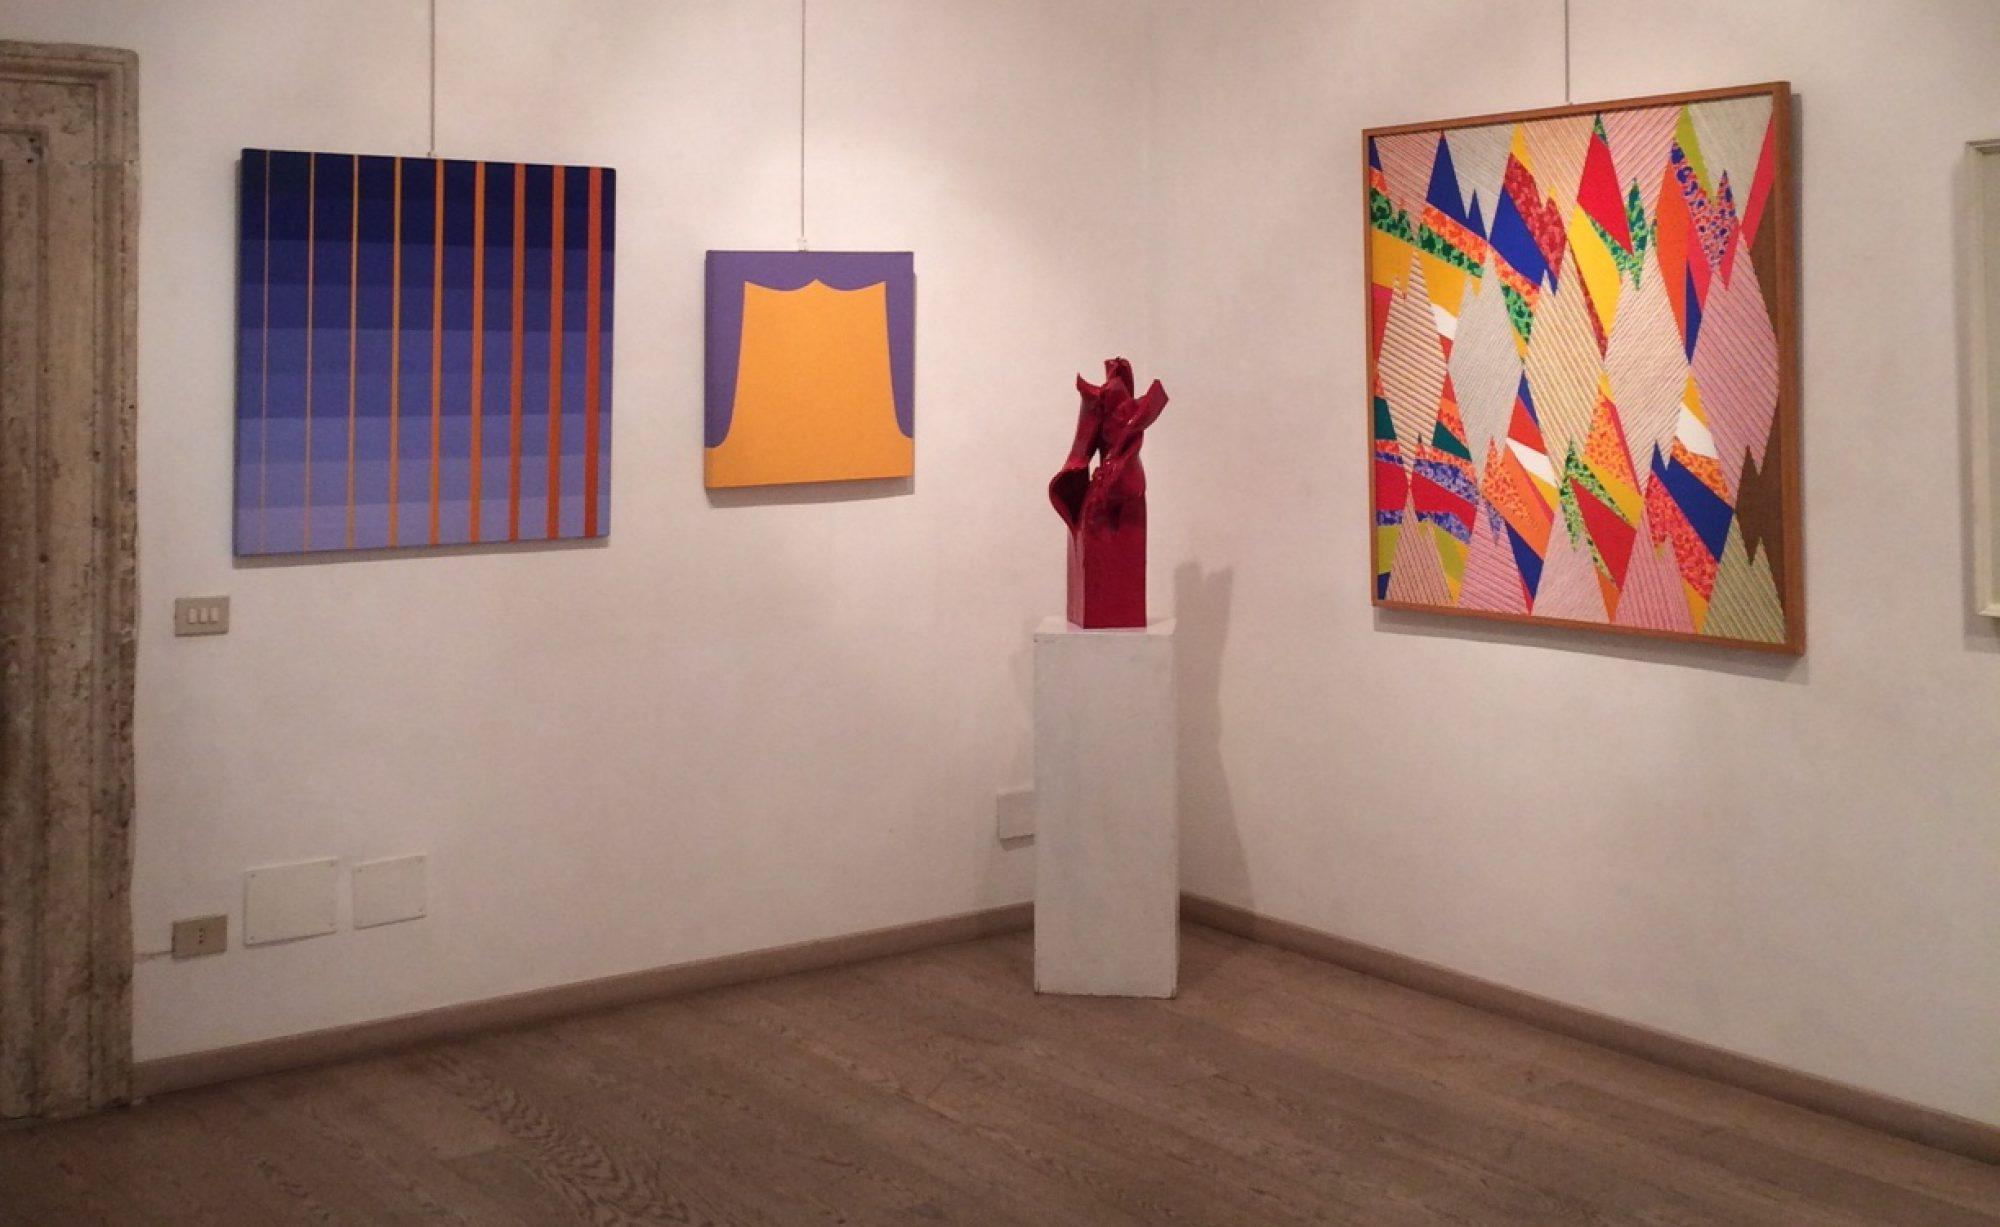 Galleria Edieuropa